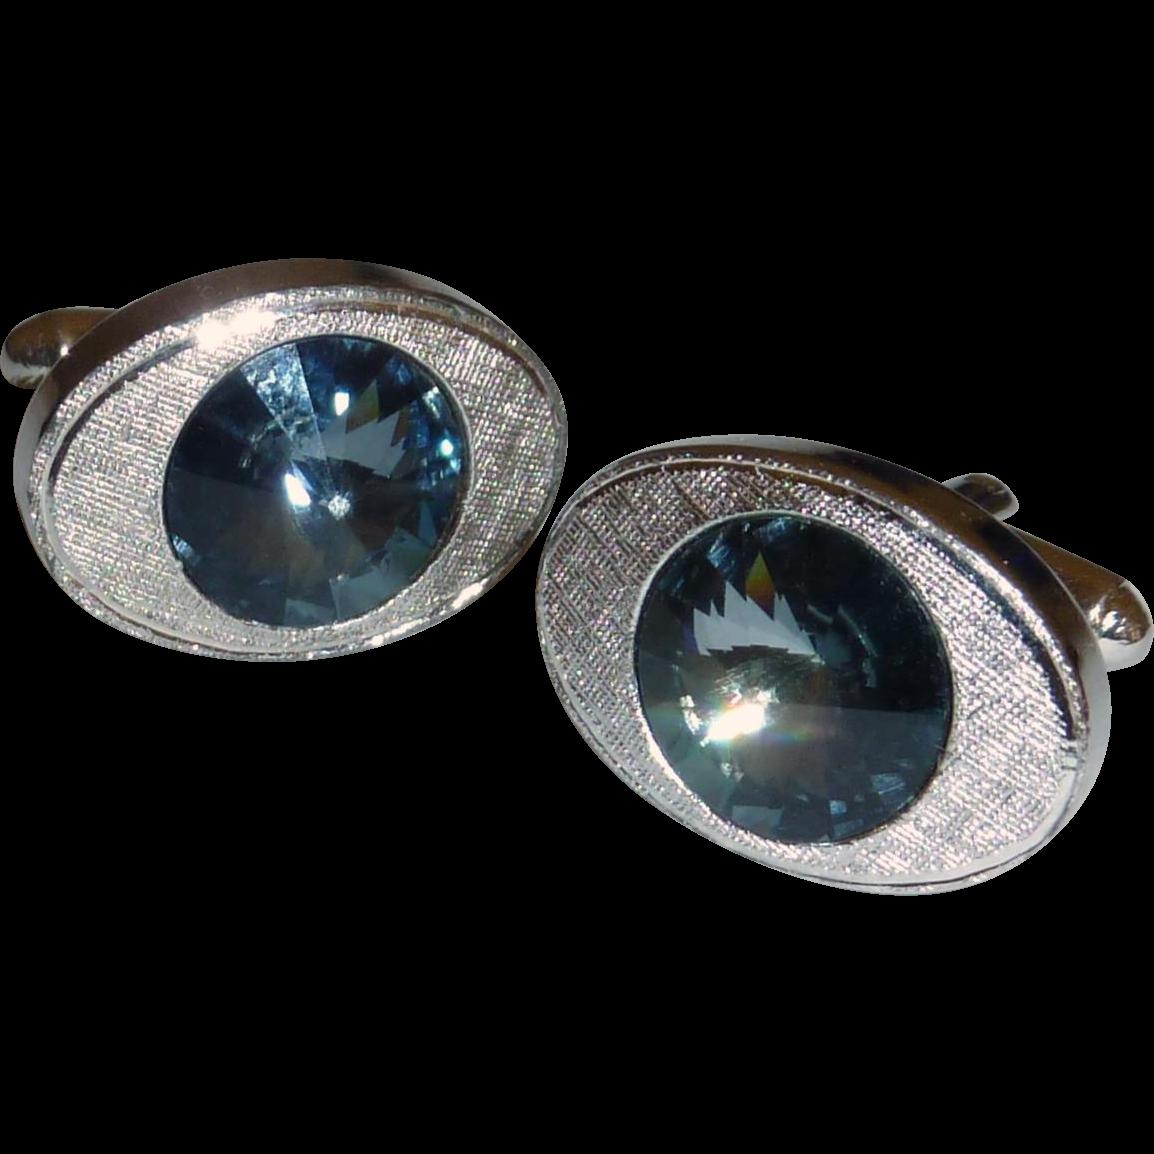 Shields Silver Tone Blue Glass Cufflinks Cuff Links